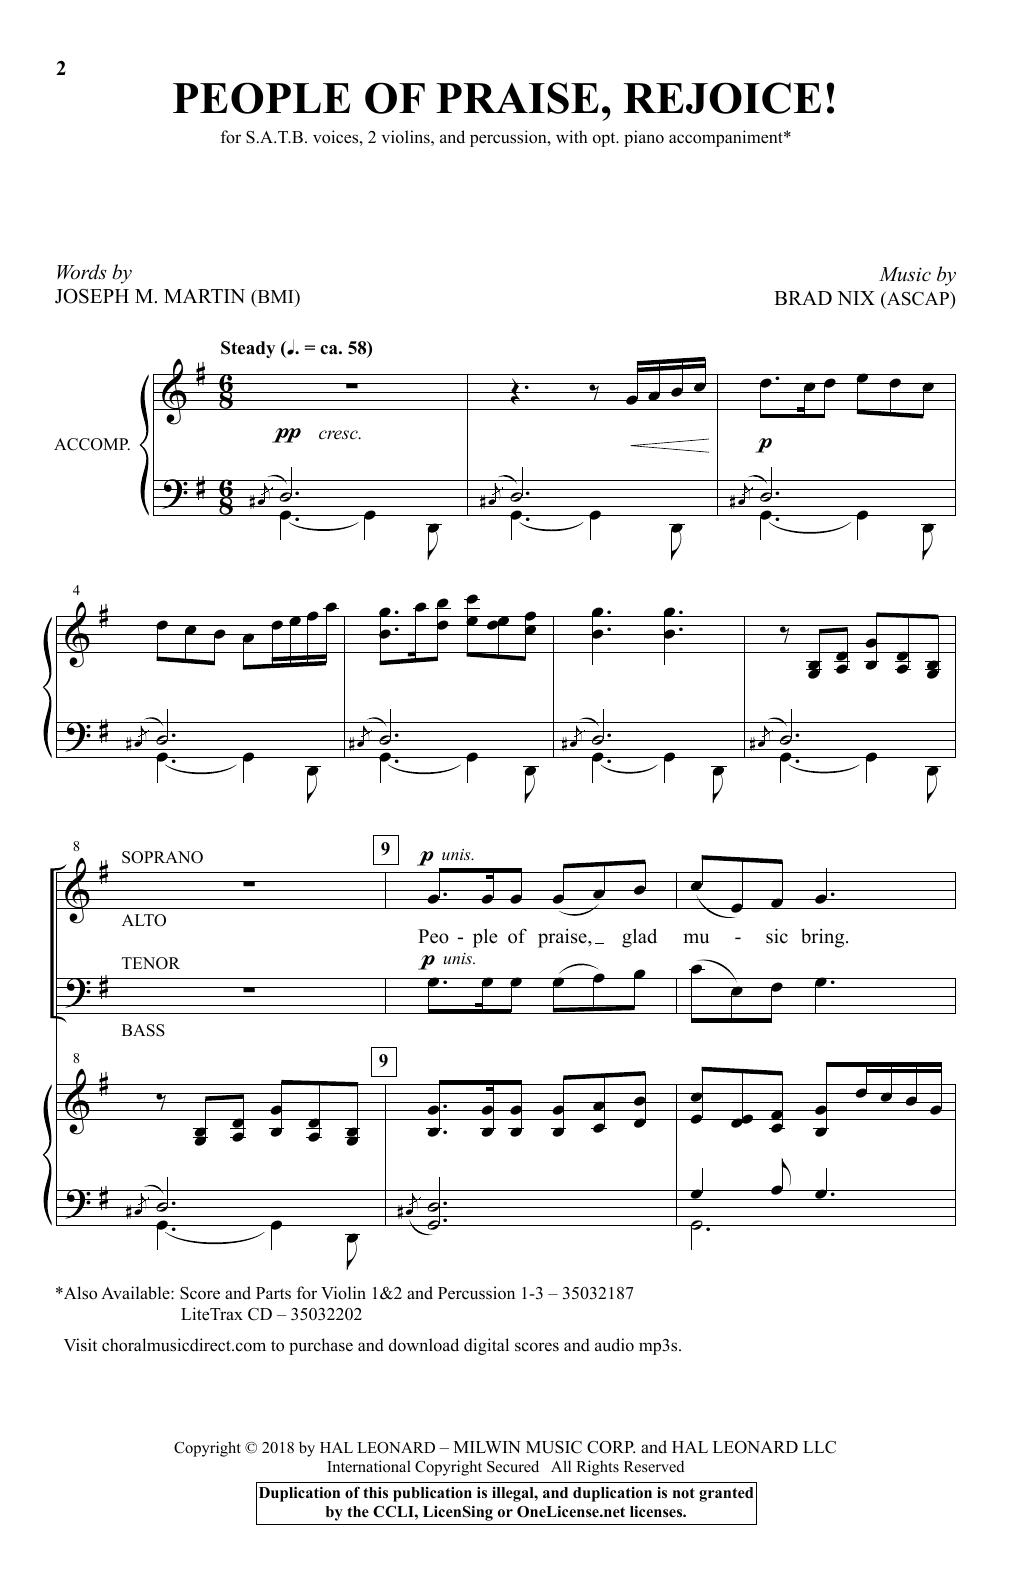 Brad Nix People Of Praise, Rejoice! sheet music notes and chords. Download Printable PDF.